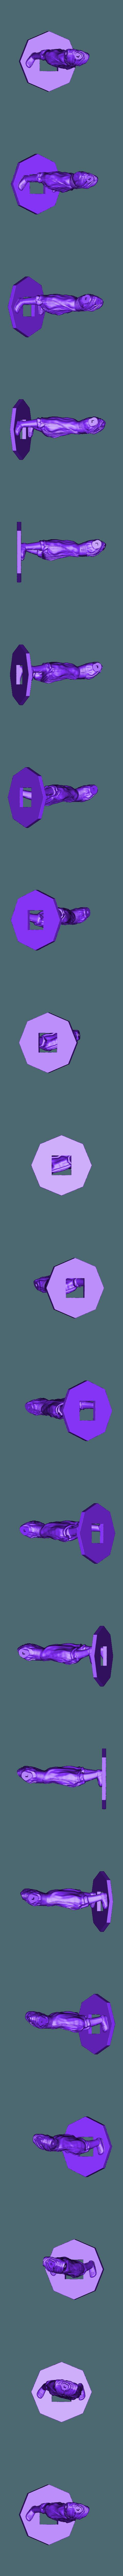 Body.stl Download free STL file MOVED-Darth Maul with Multi-Color Head • 3D printable model, Double_Alfa_3D